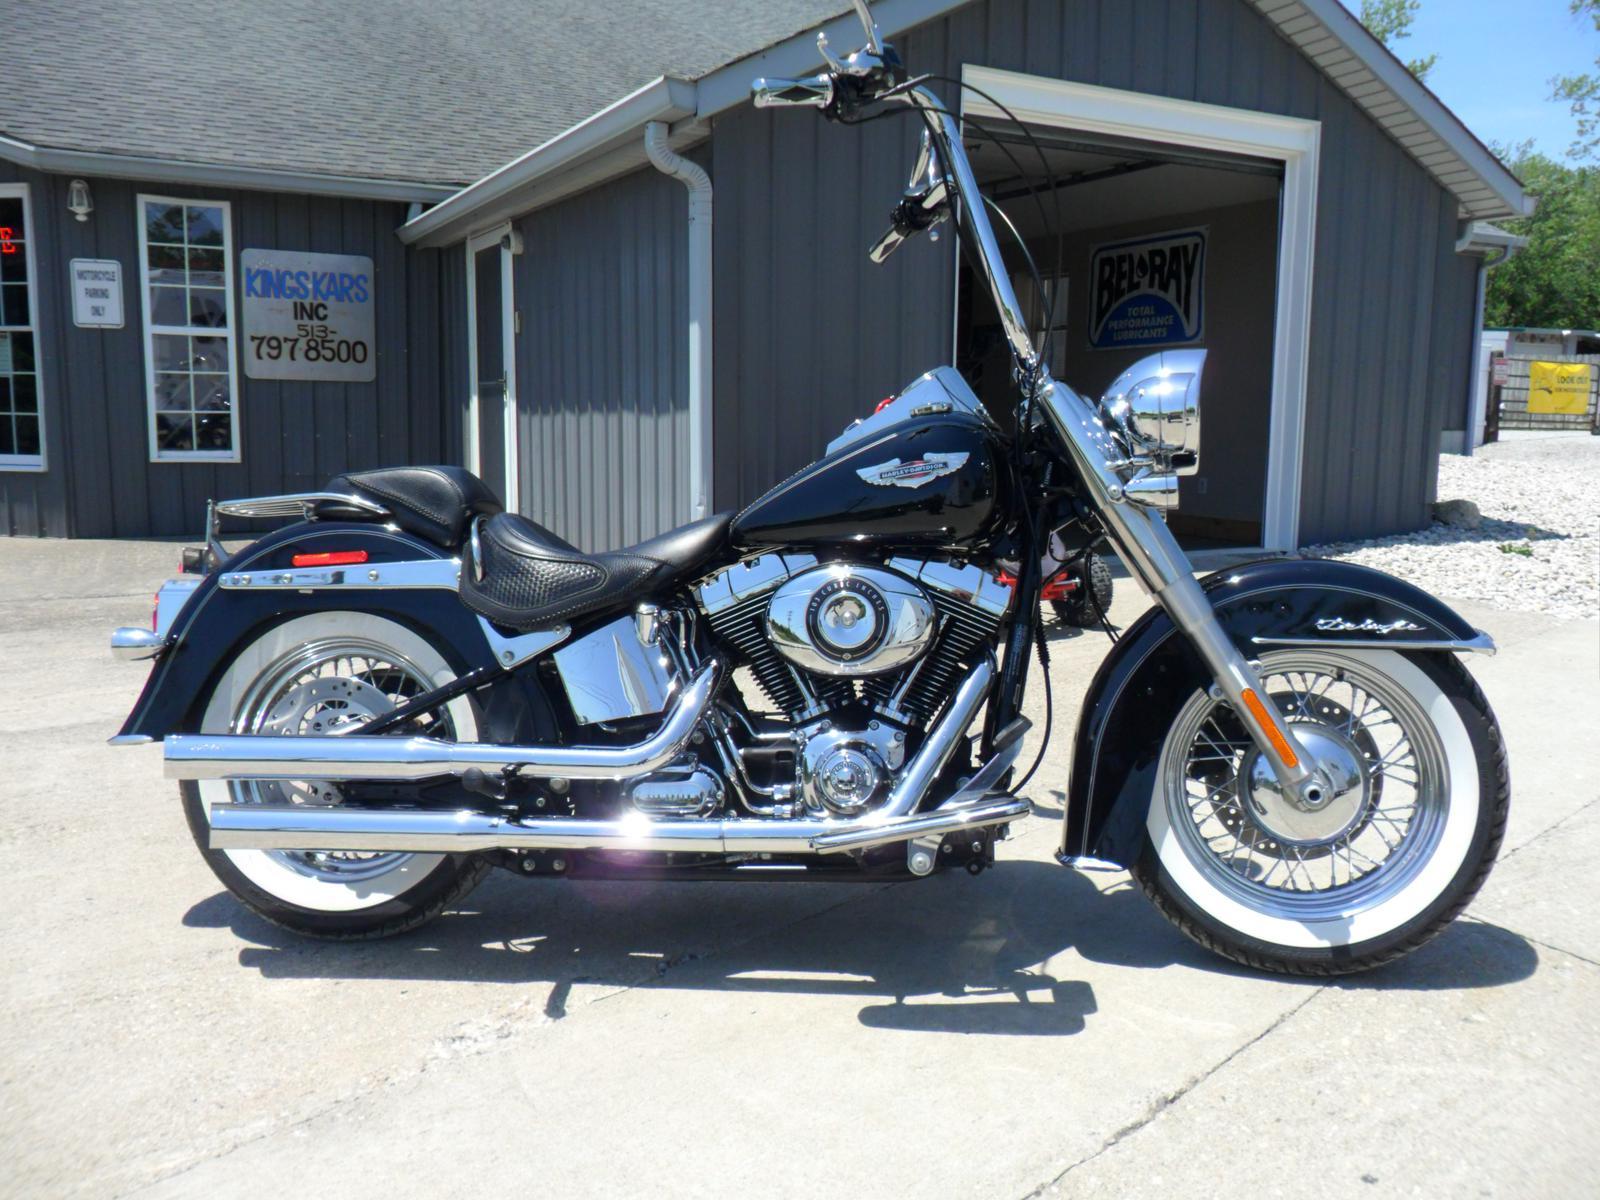 91 Blue Book Snowmobiles Harley Davidson Motorcycles Atvs